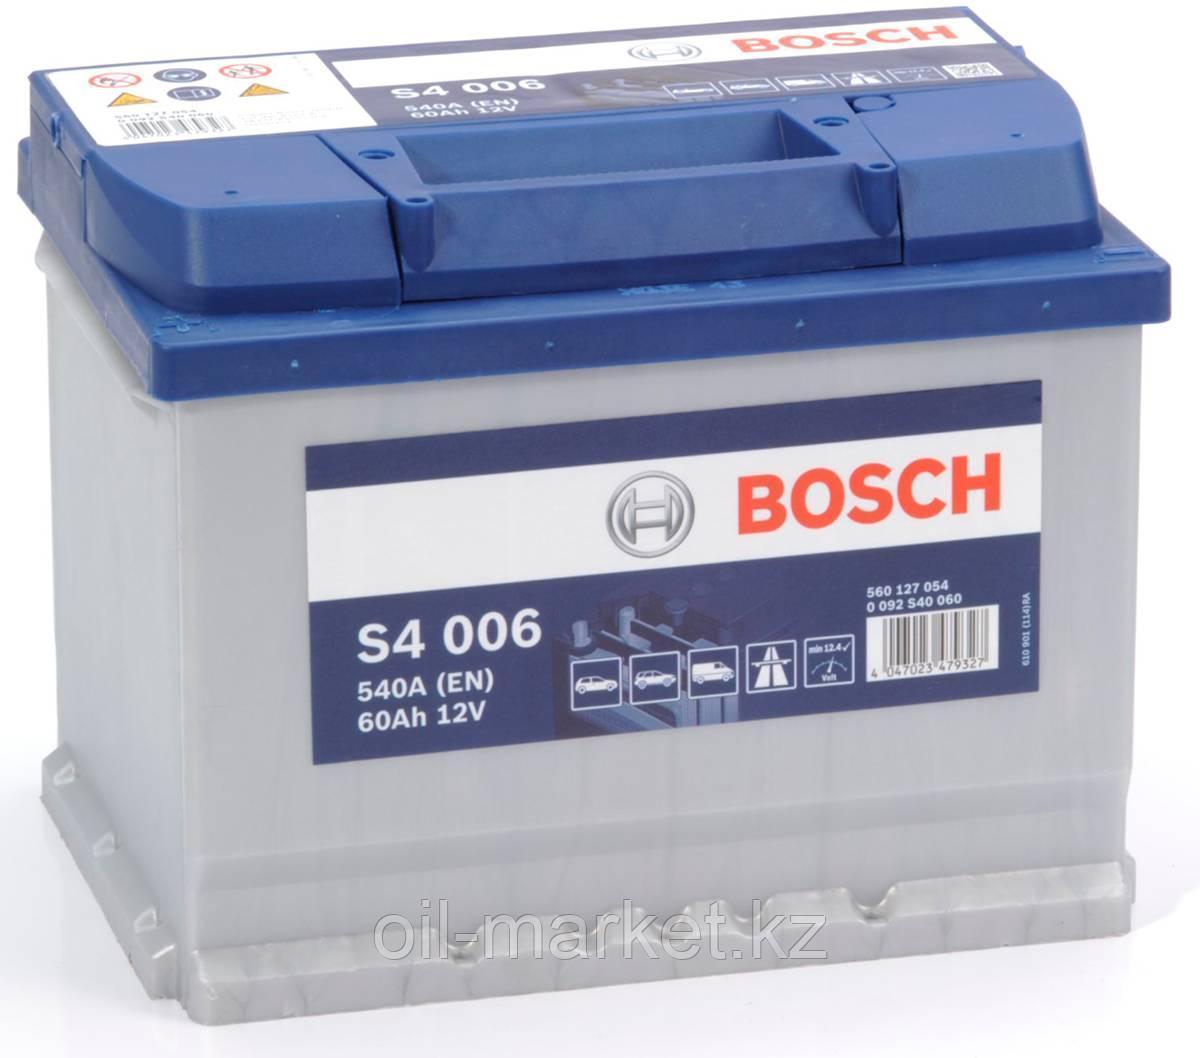 Аккумулятор Bosch EURO 60 Ah